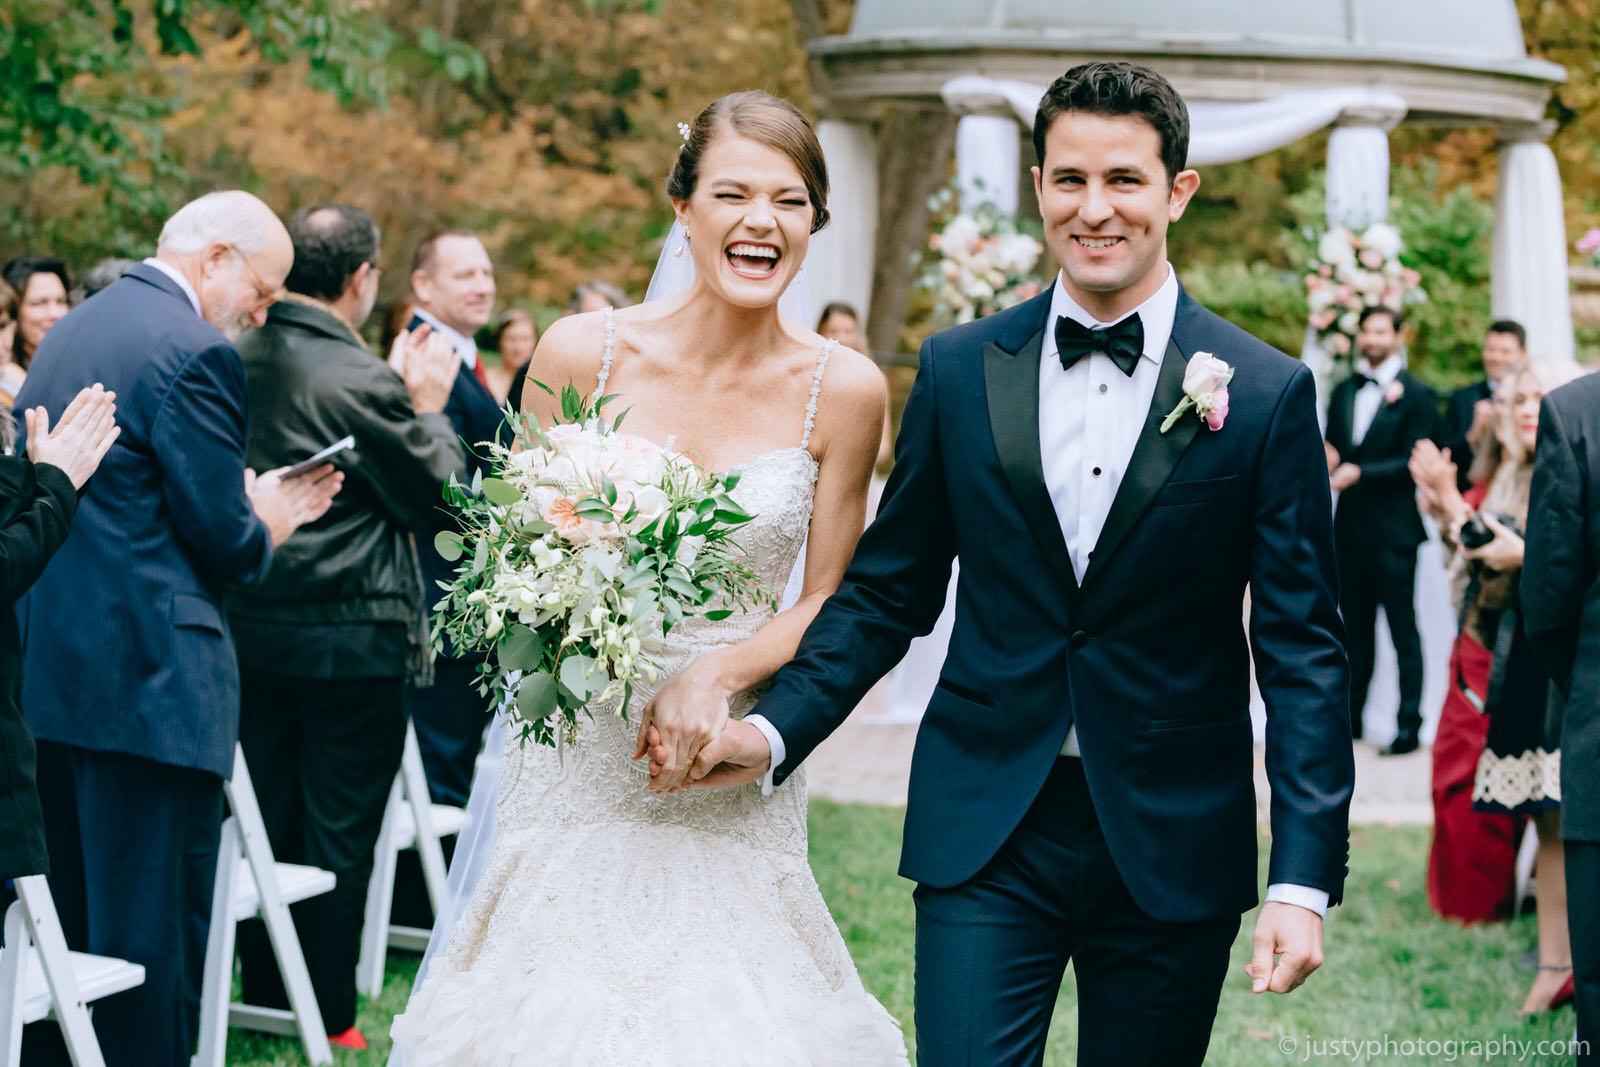 Omni Shoreham wedding photos-washington-dc-wedding-venues (125 of 171).jpg